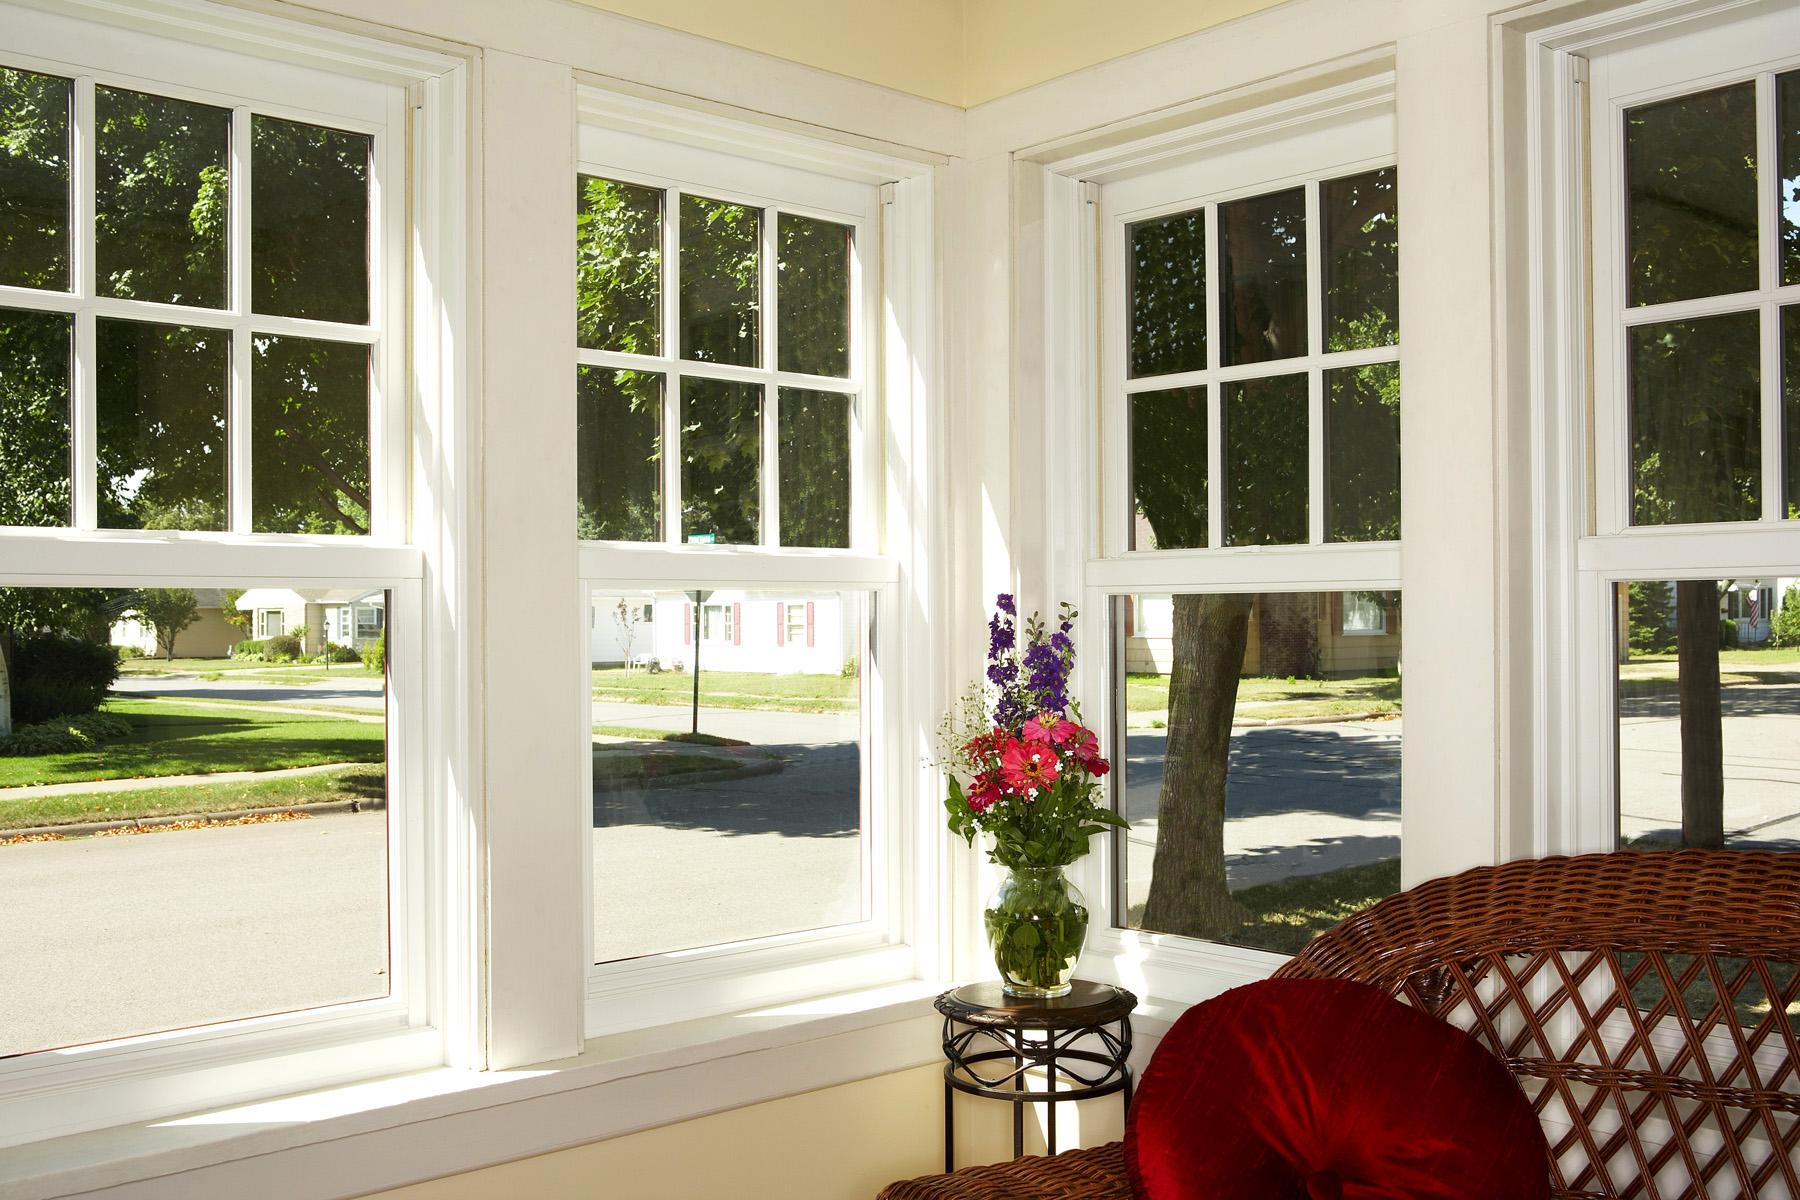 Interior window frames - Hm Dulley 1 C764 1 Jpg